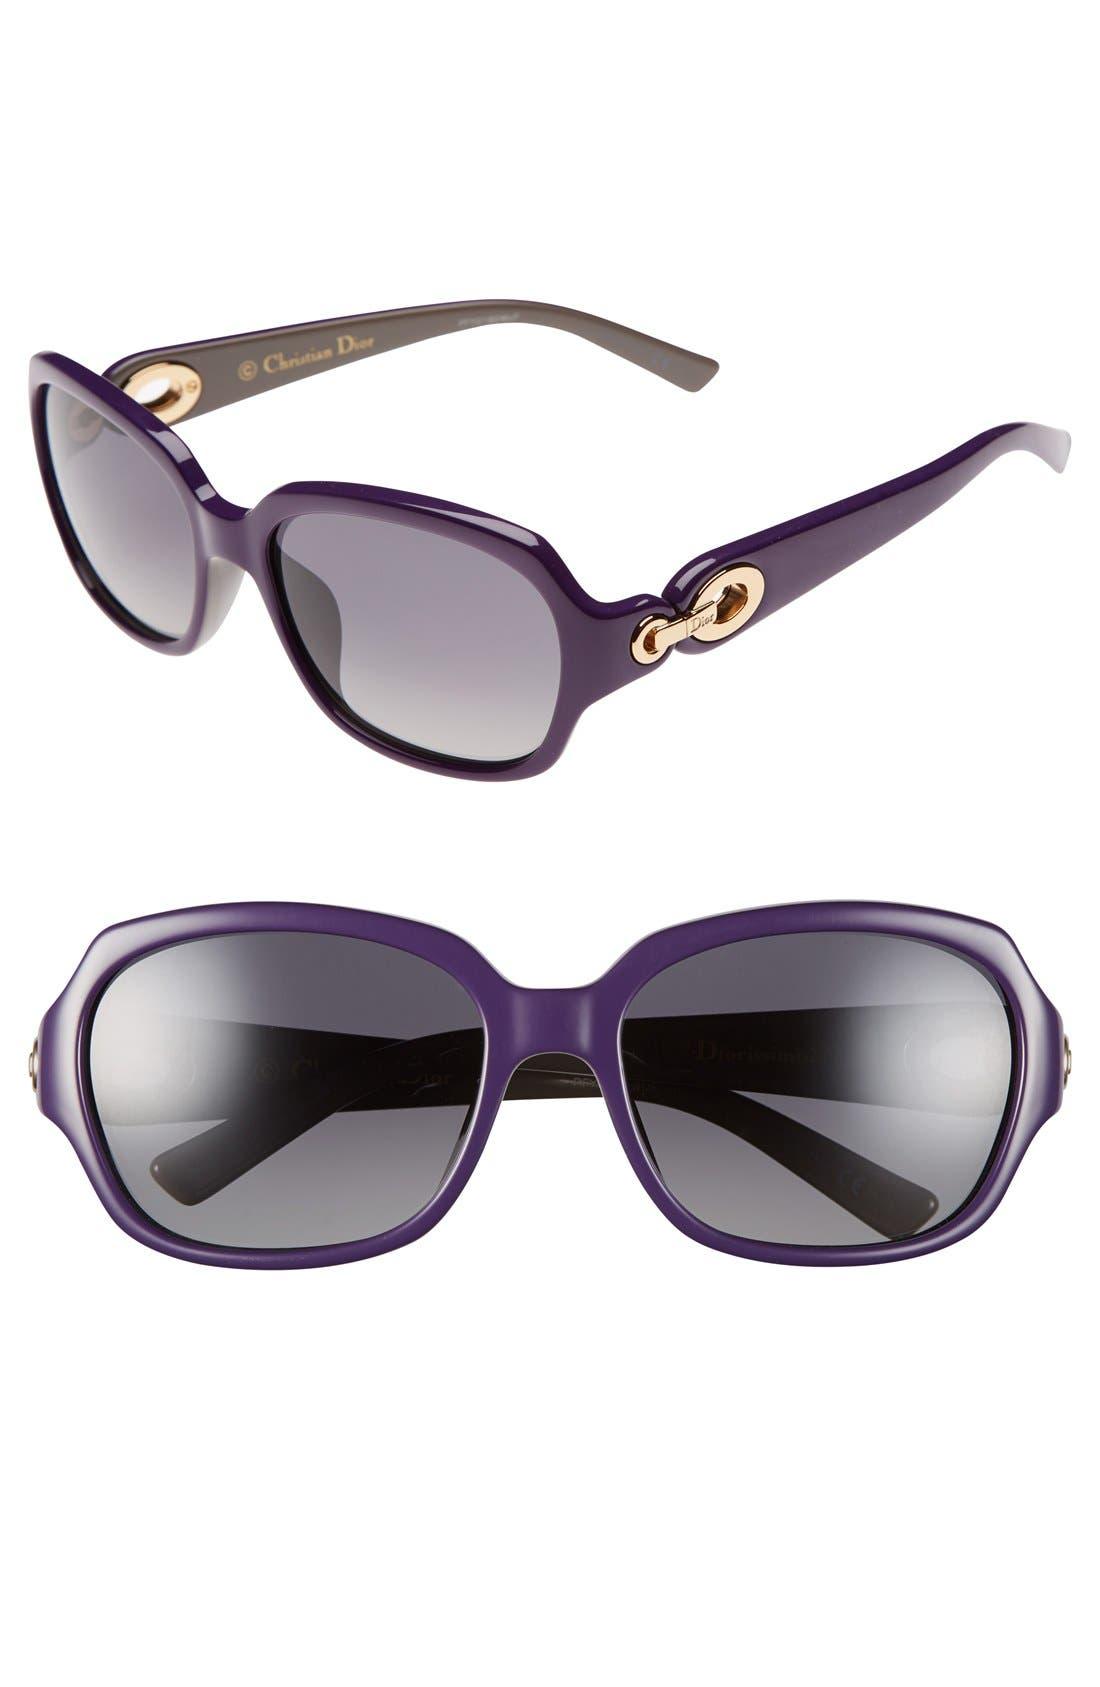 Main Image - Christian Dior 56mm Polarized Sunglasses